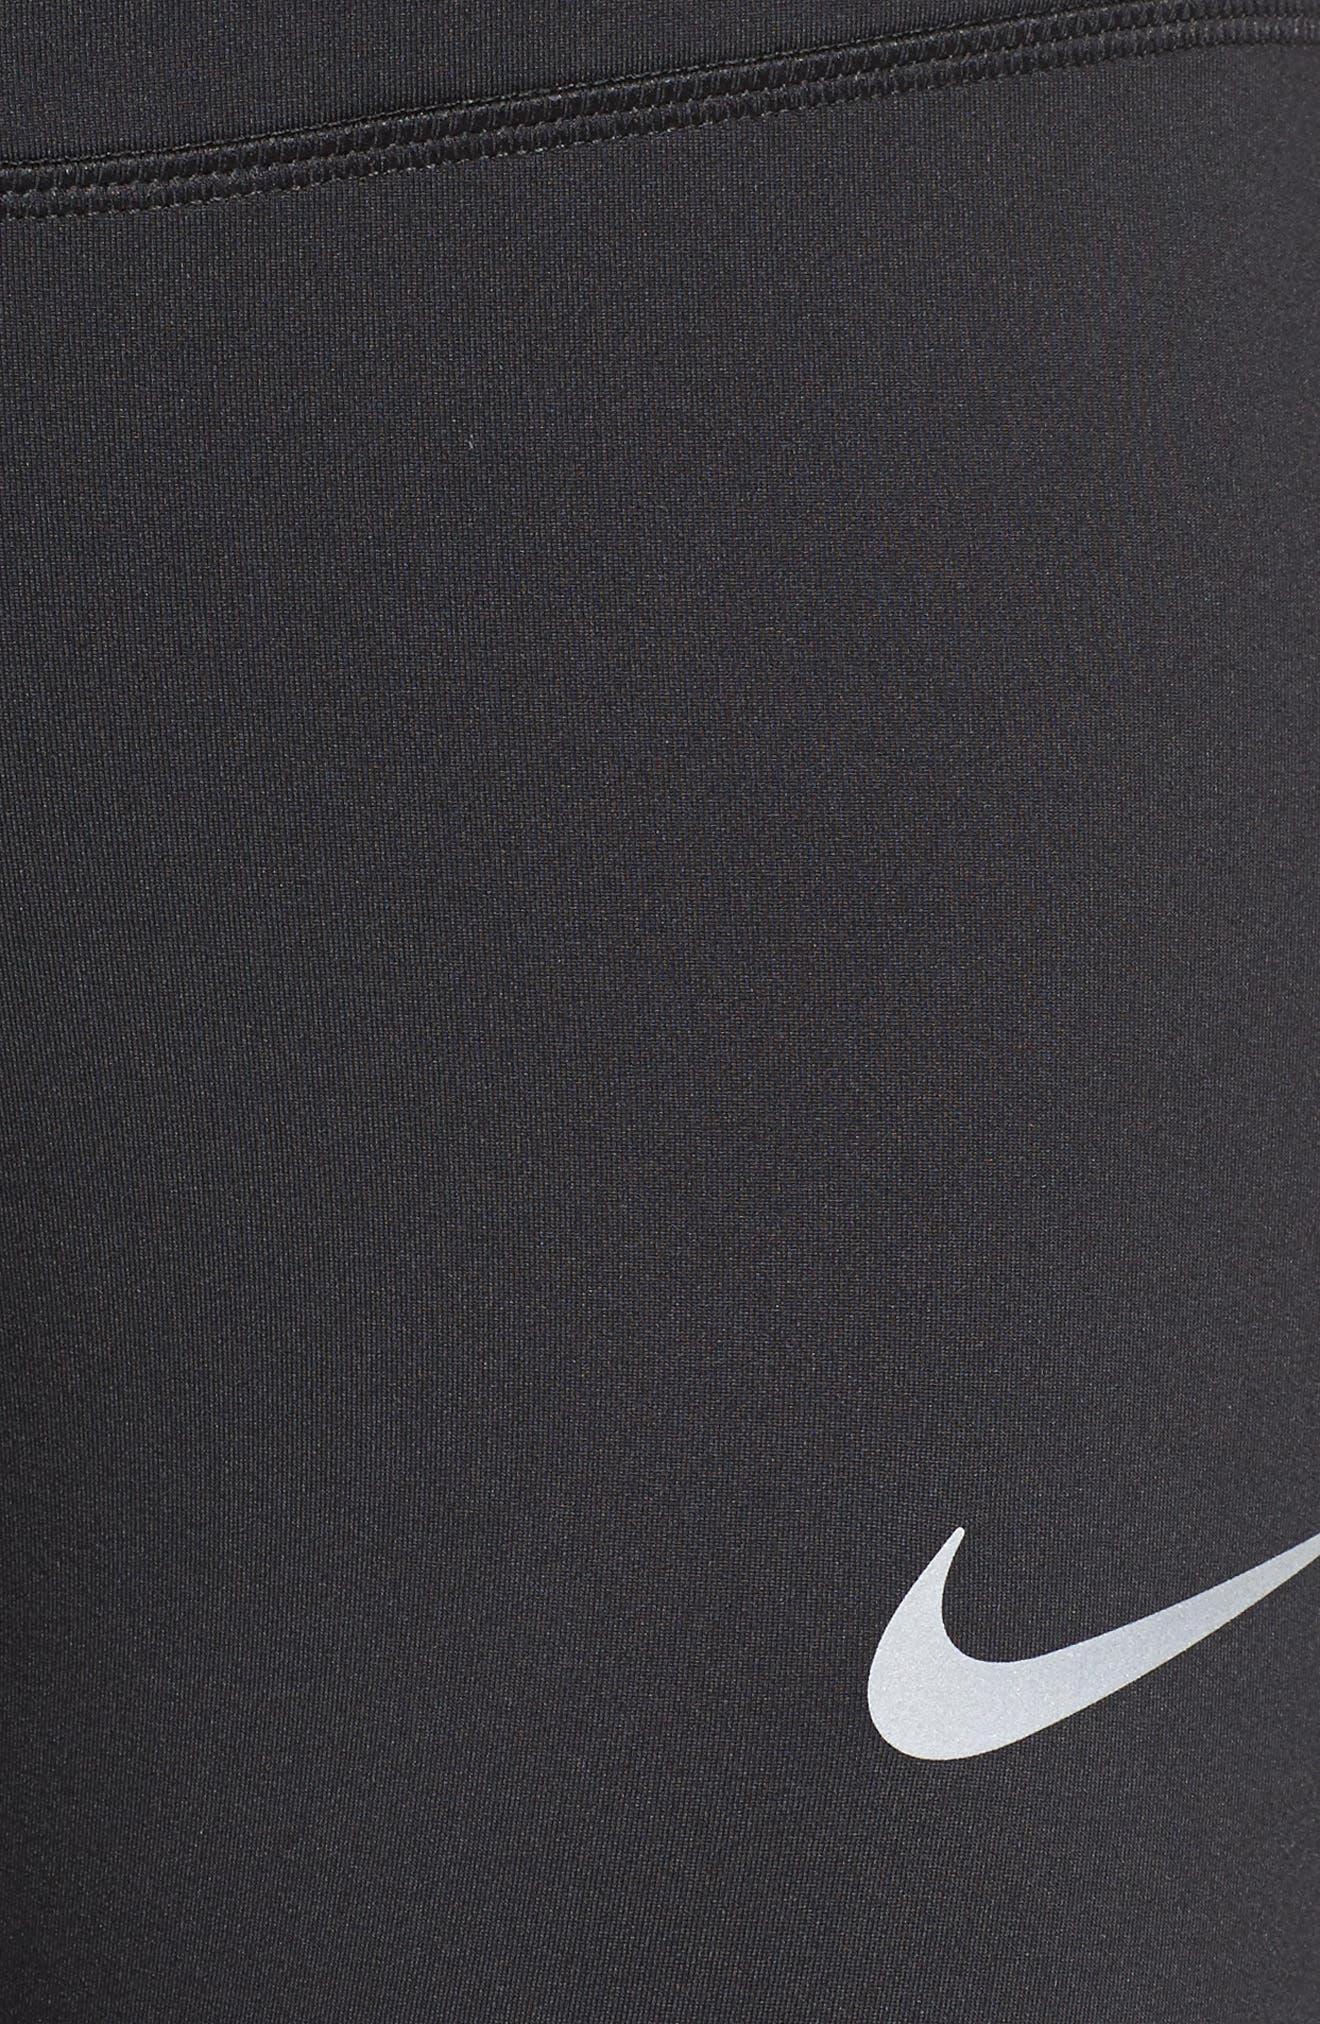 Alternate Image 5  - Nike Power Epic Running Tights